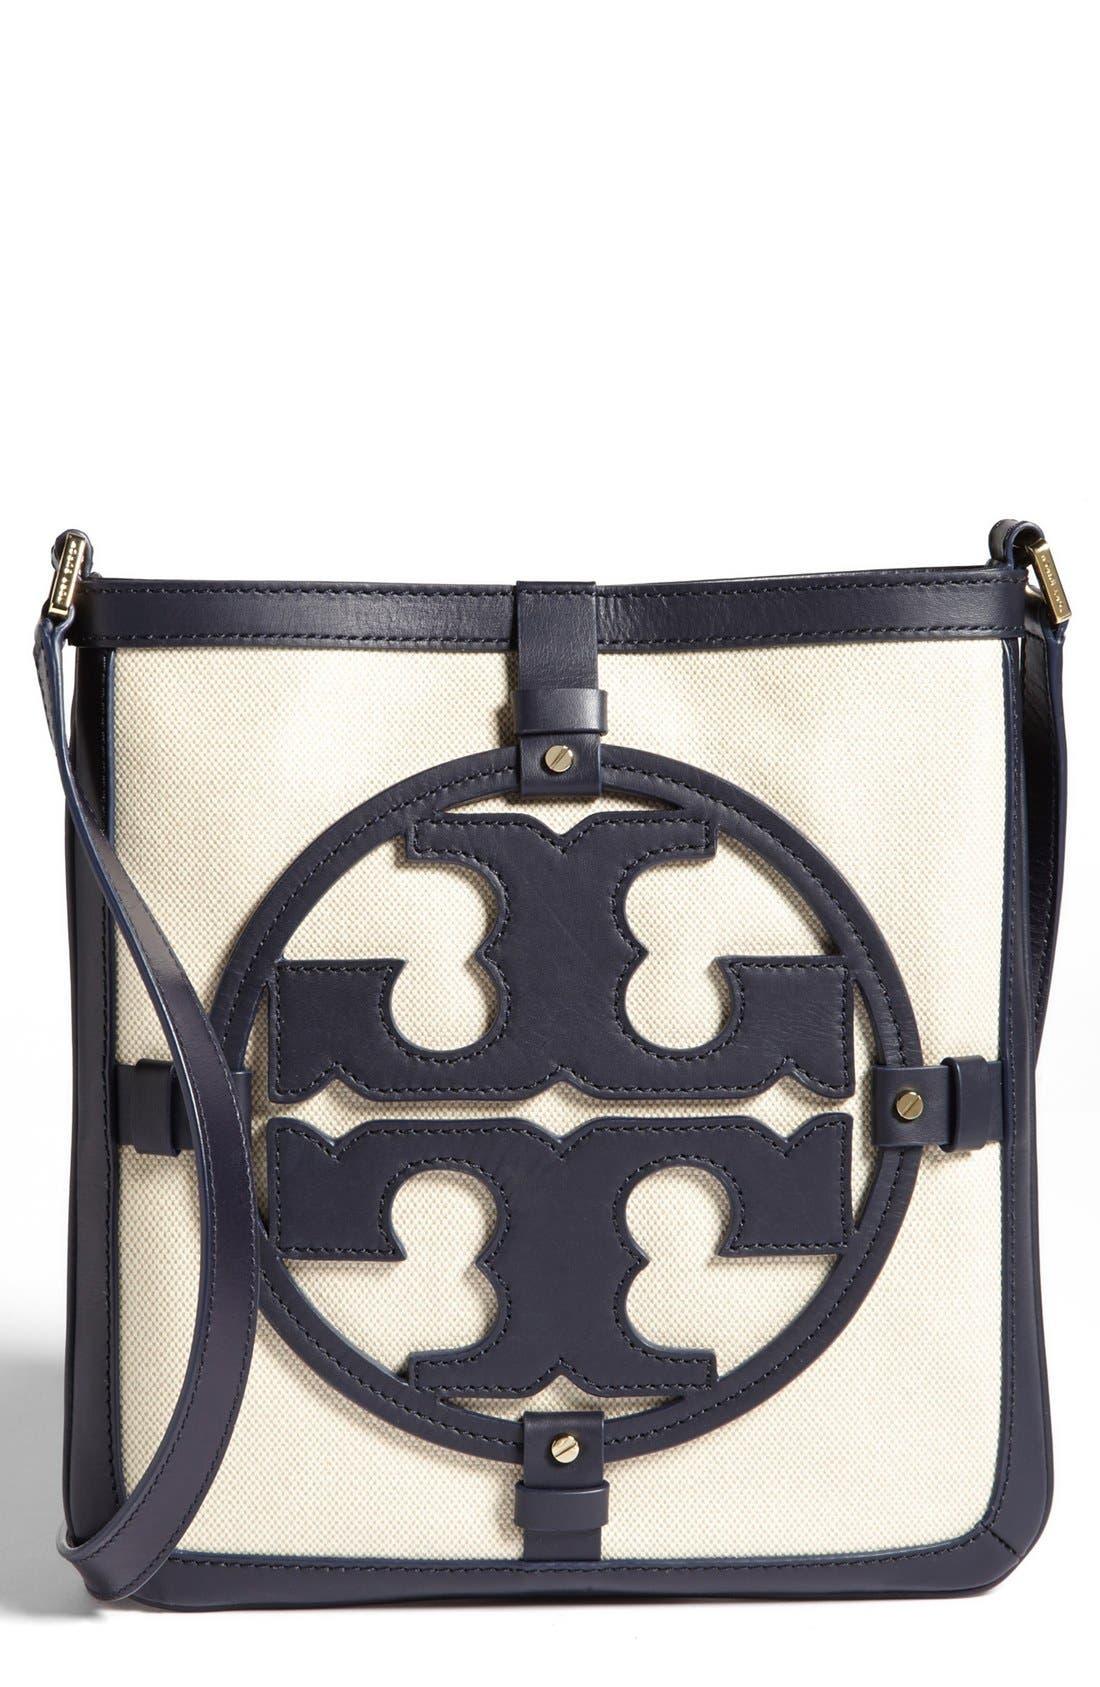 Main Image - Tory Burch 'Holly' Crossbody Bag